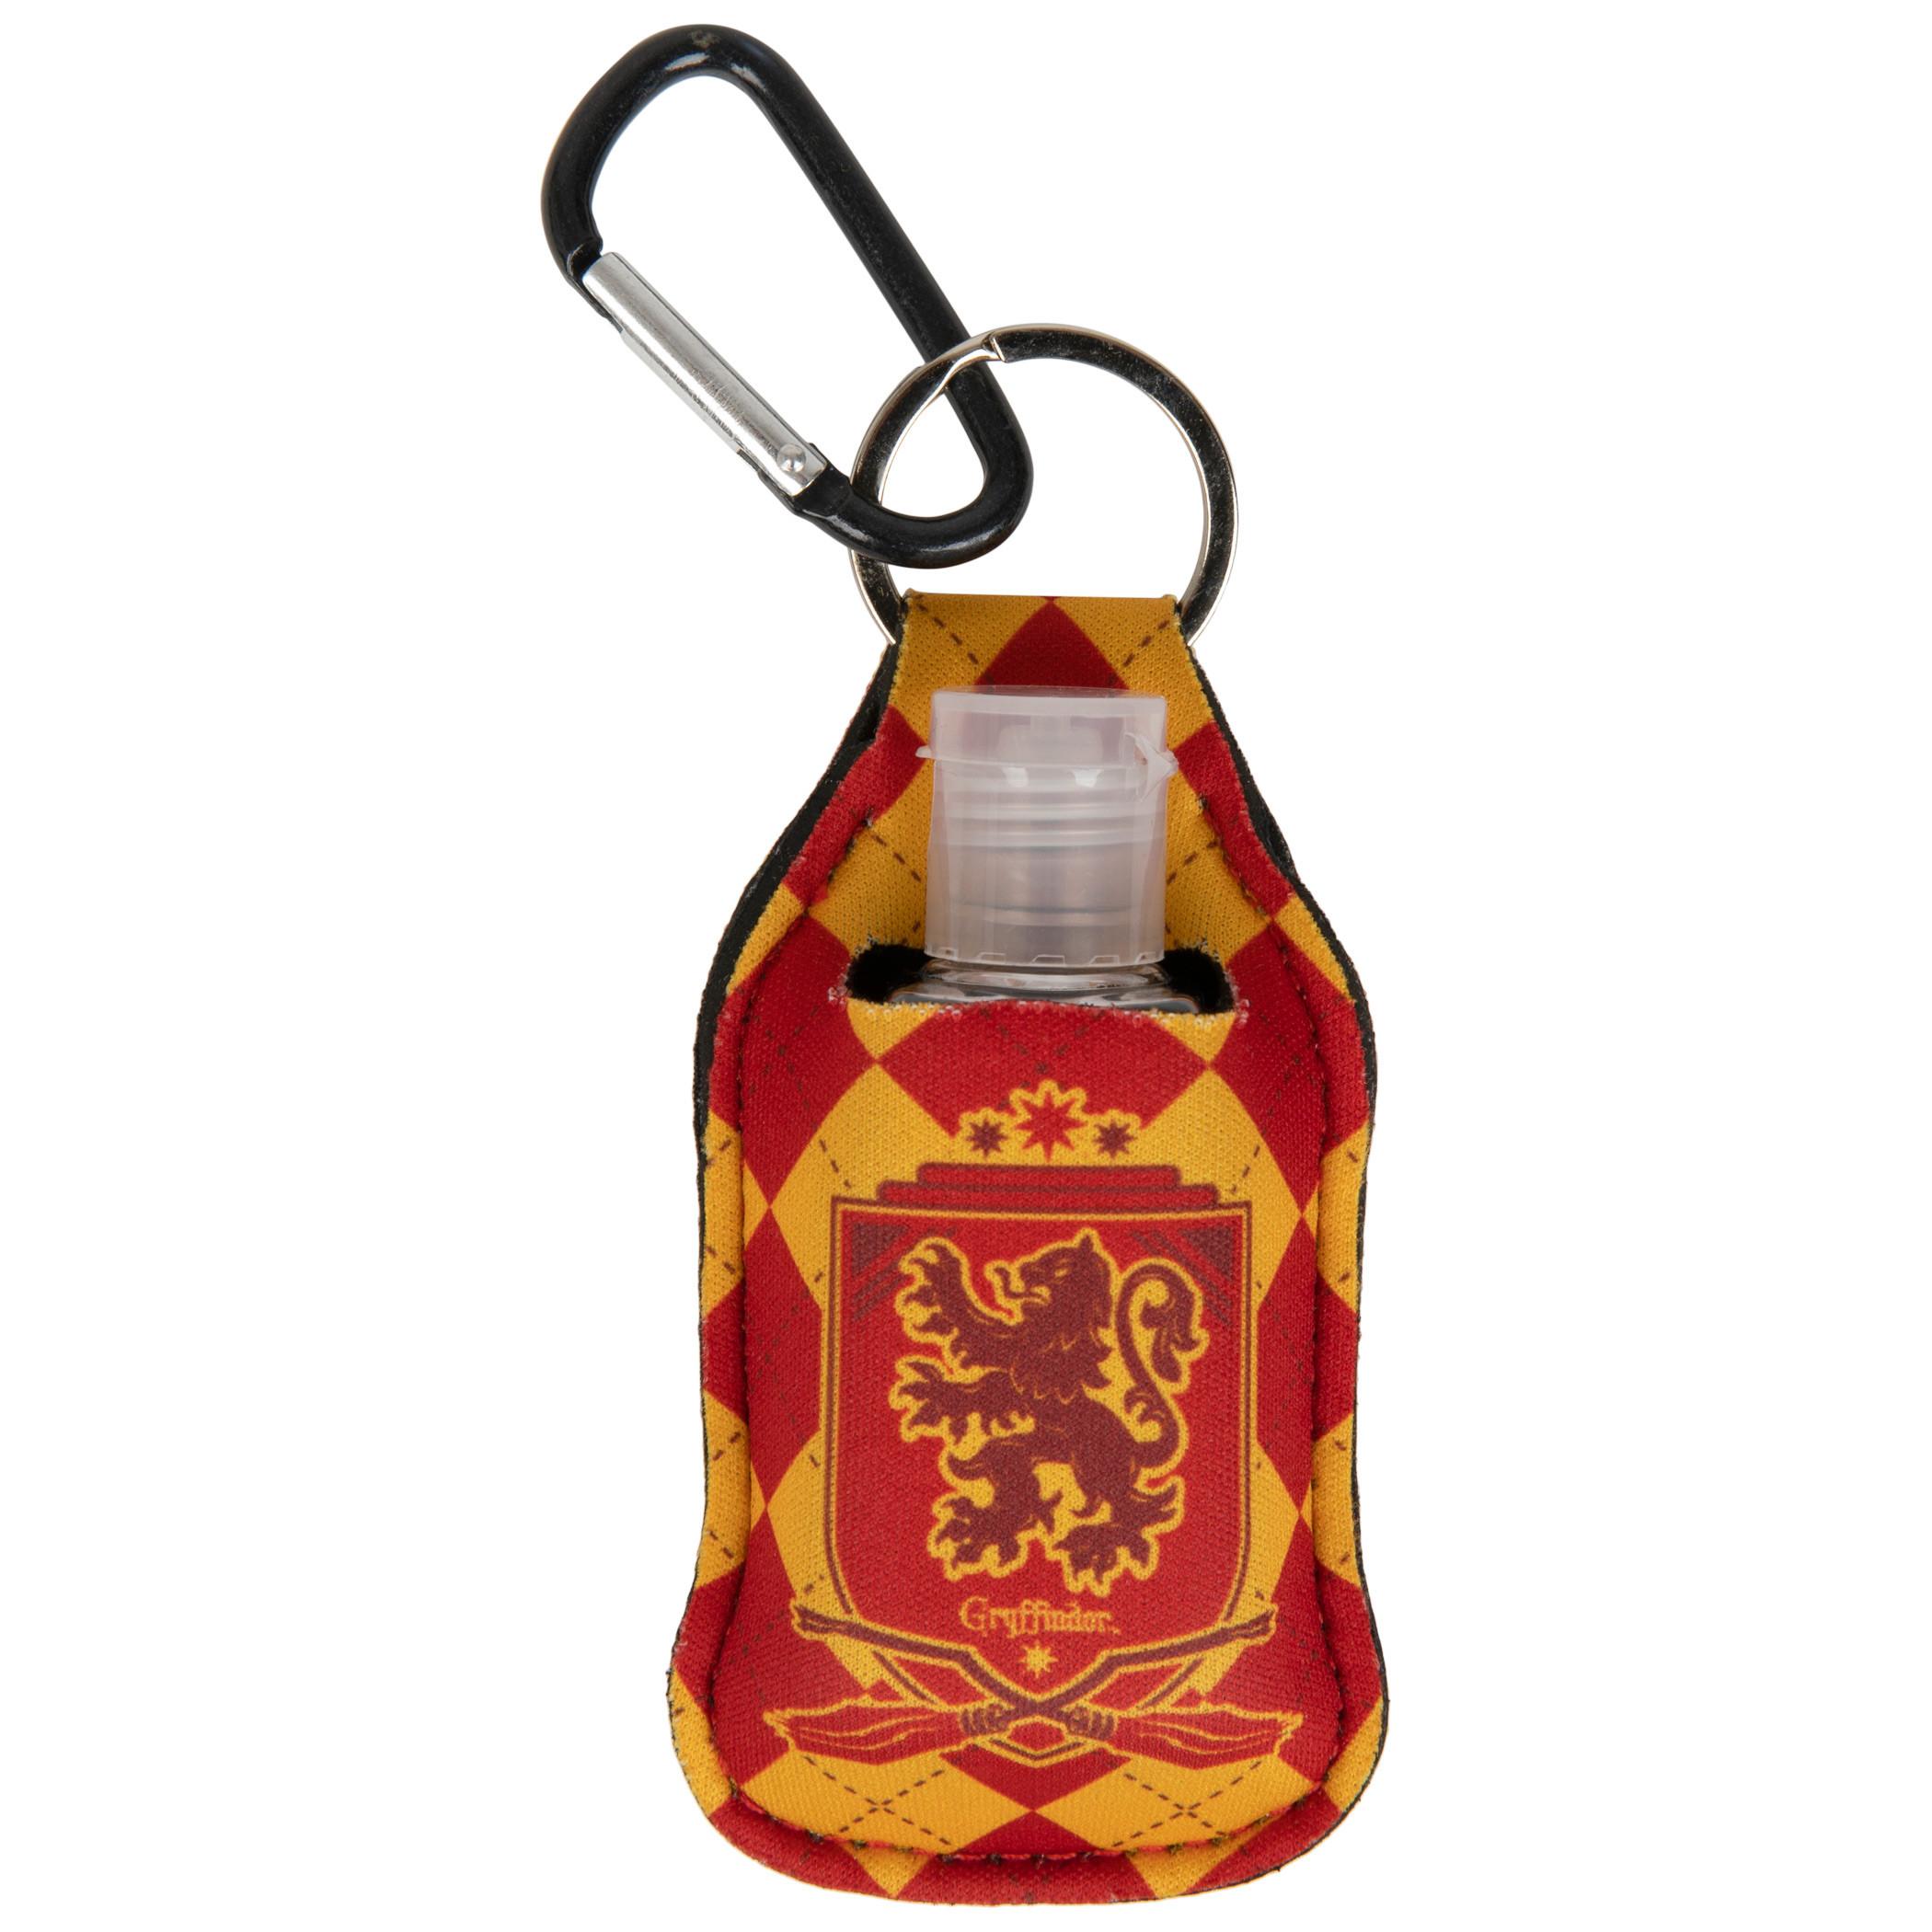 Harry Potter Gryffindor House Crest Quick Clip Hand Sanitizer